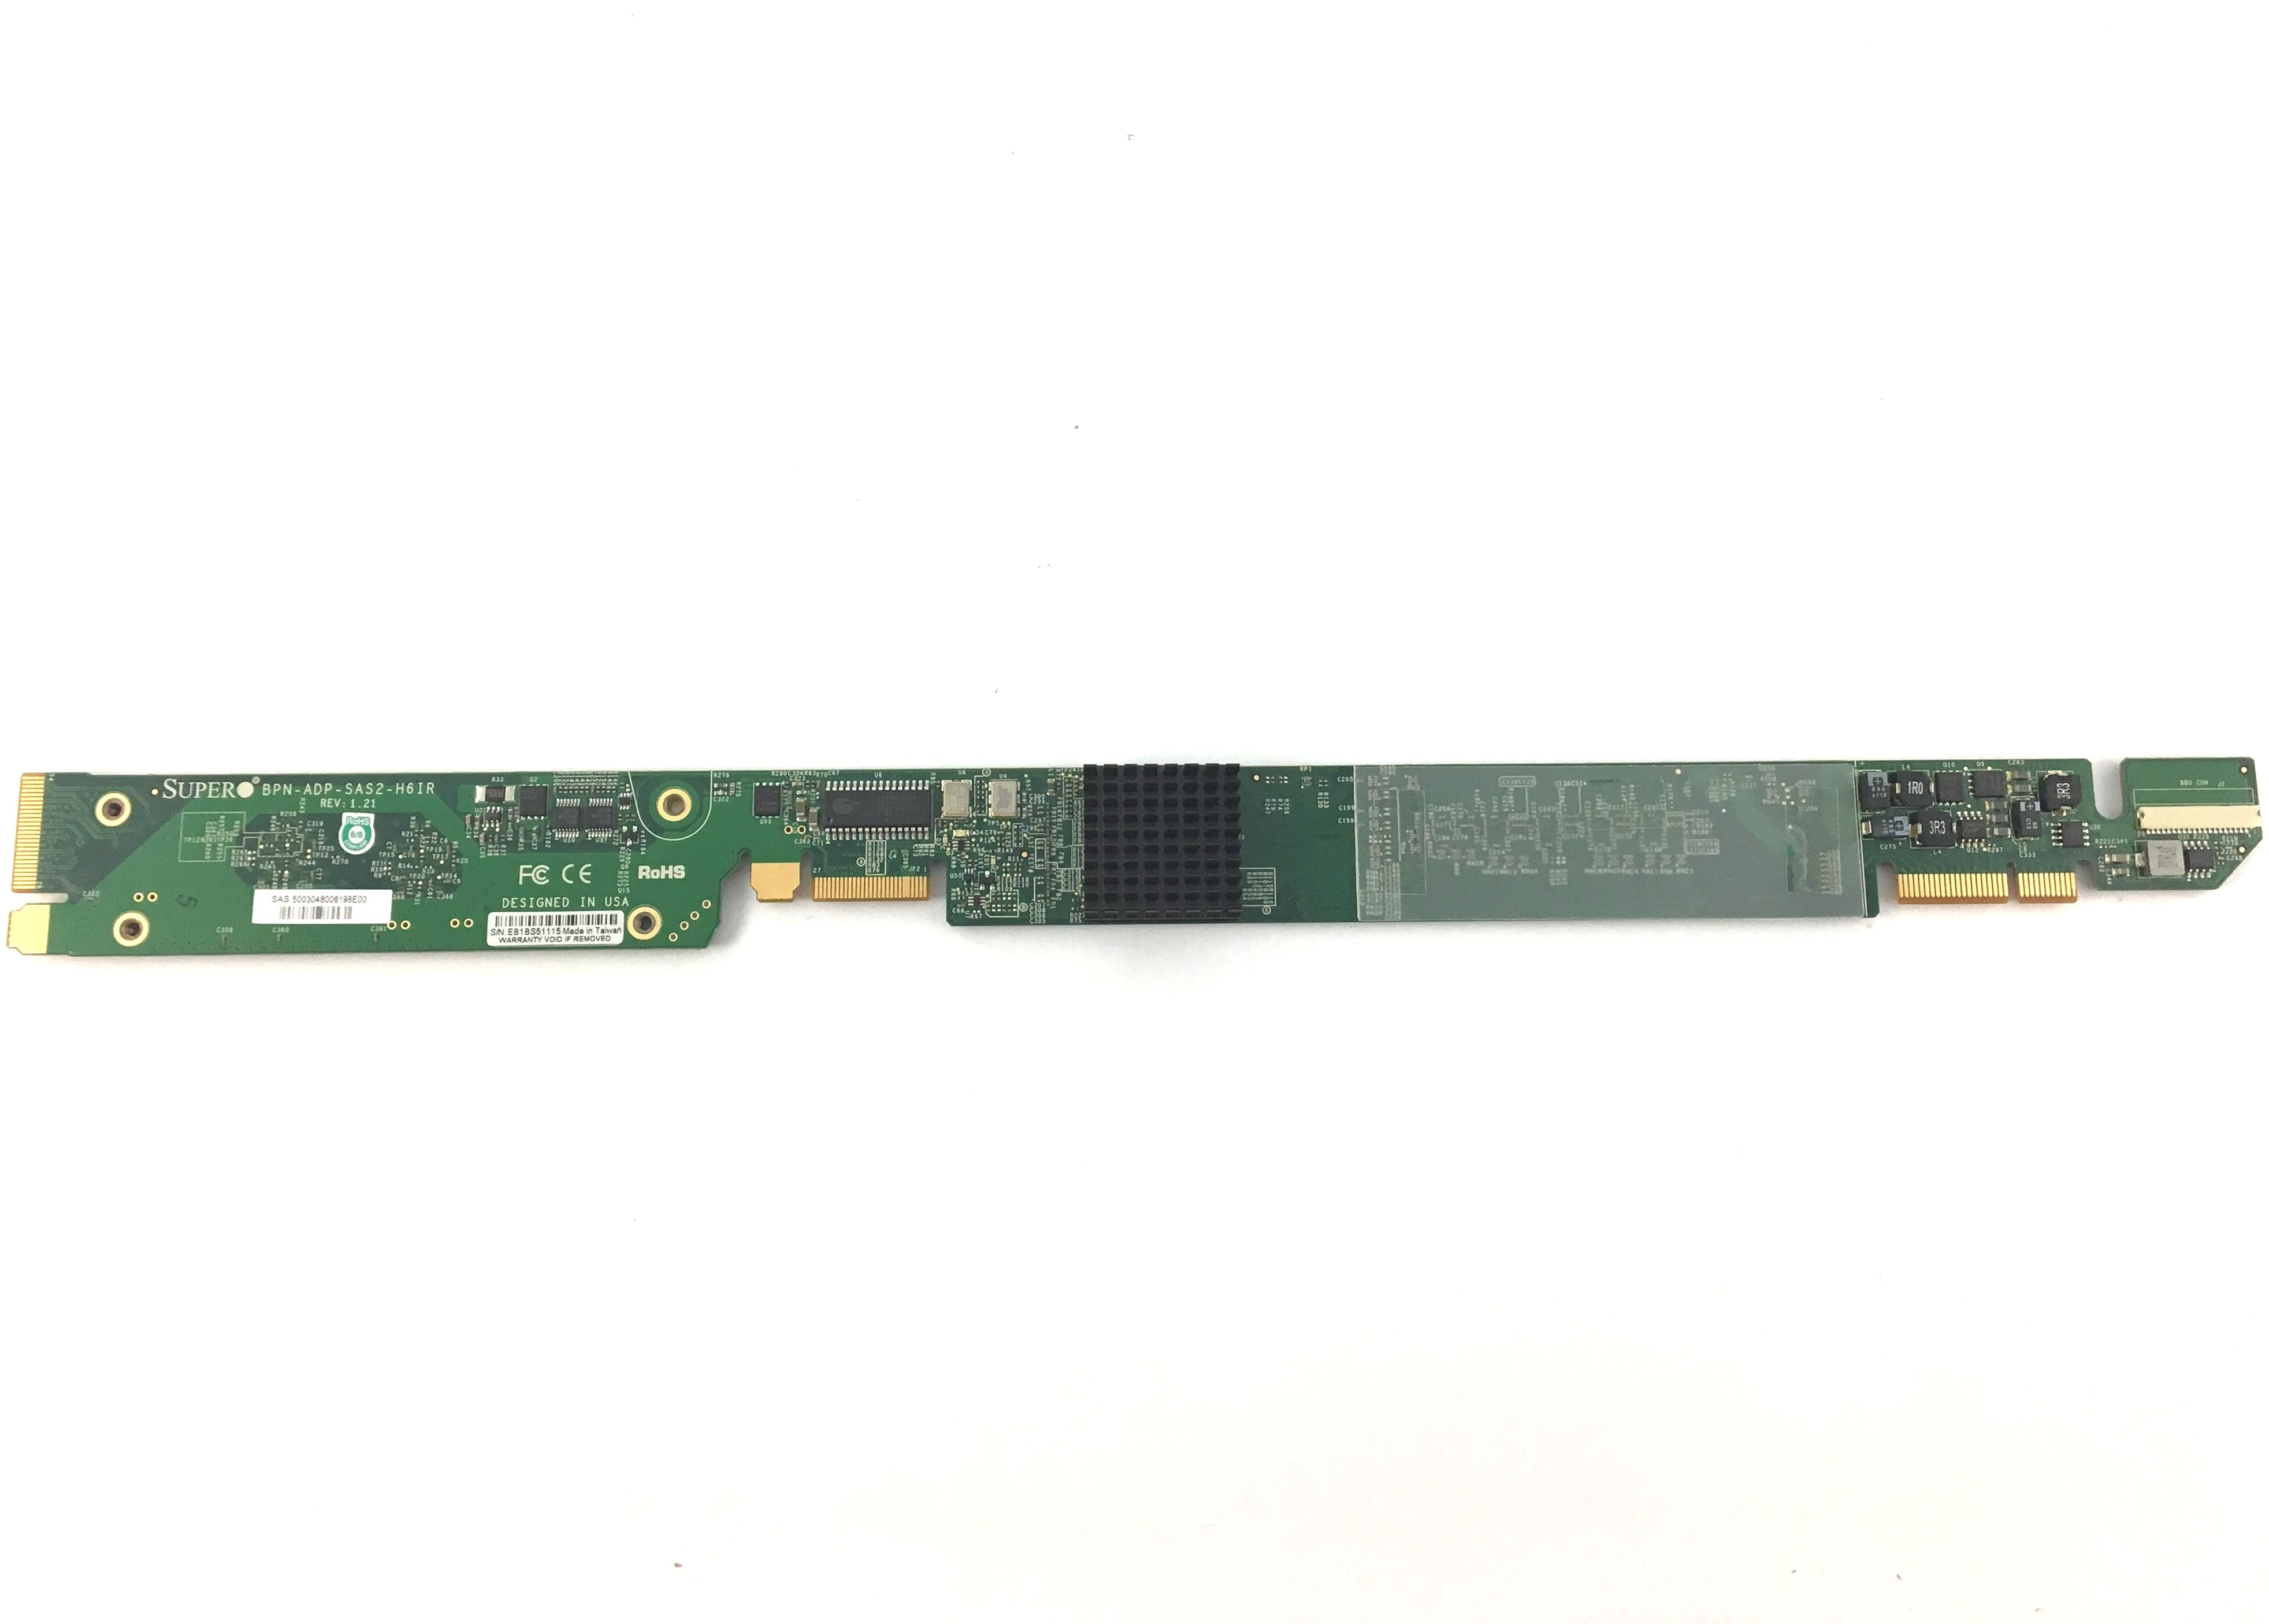 Supermicro Broadcom 2108 SAS2 Raid Support Backplane (BPN-ADP-SAS2-H6IR)